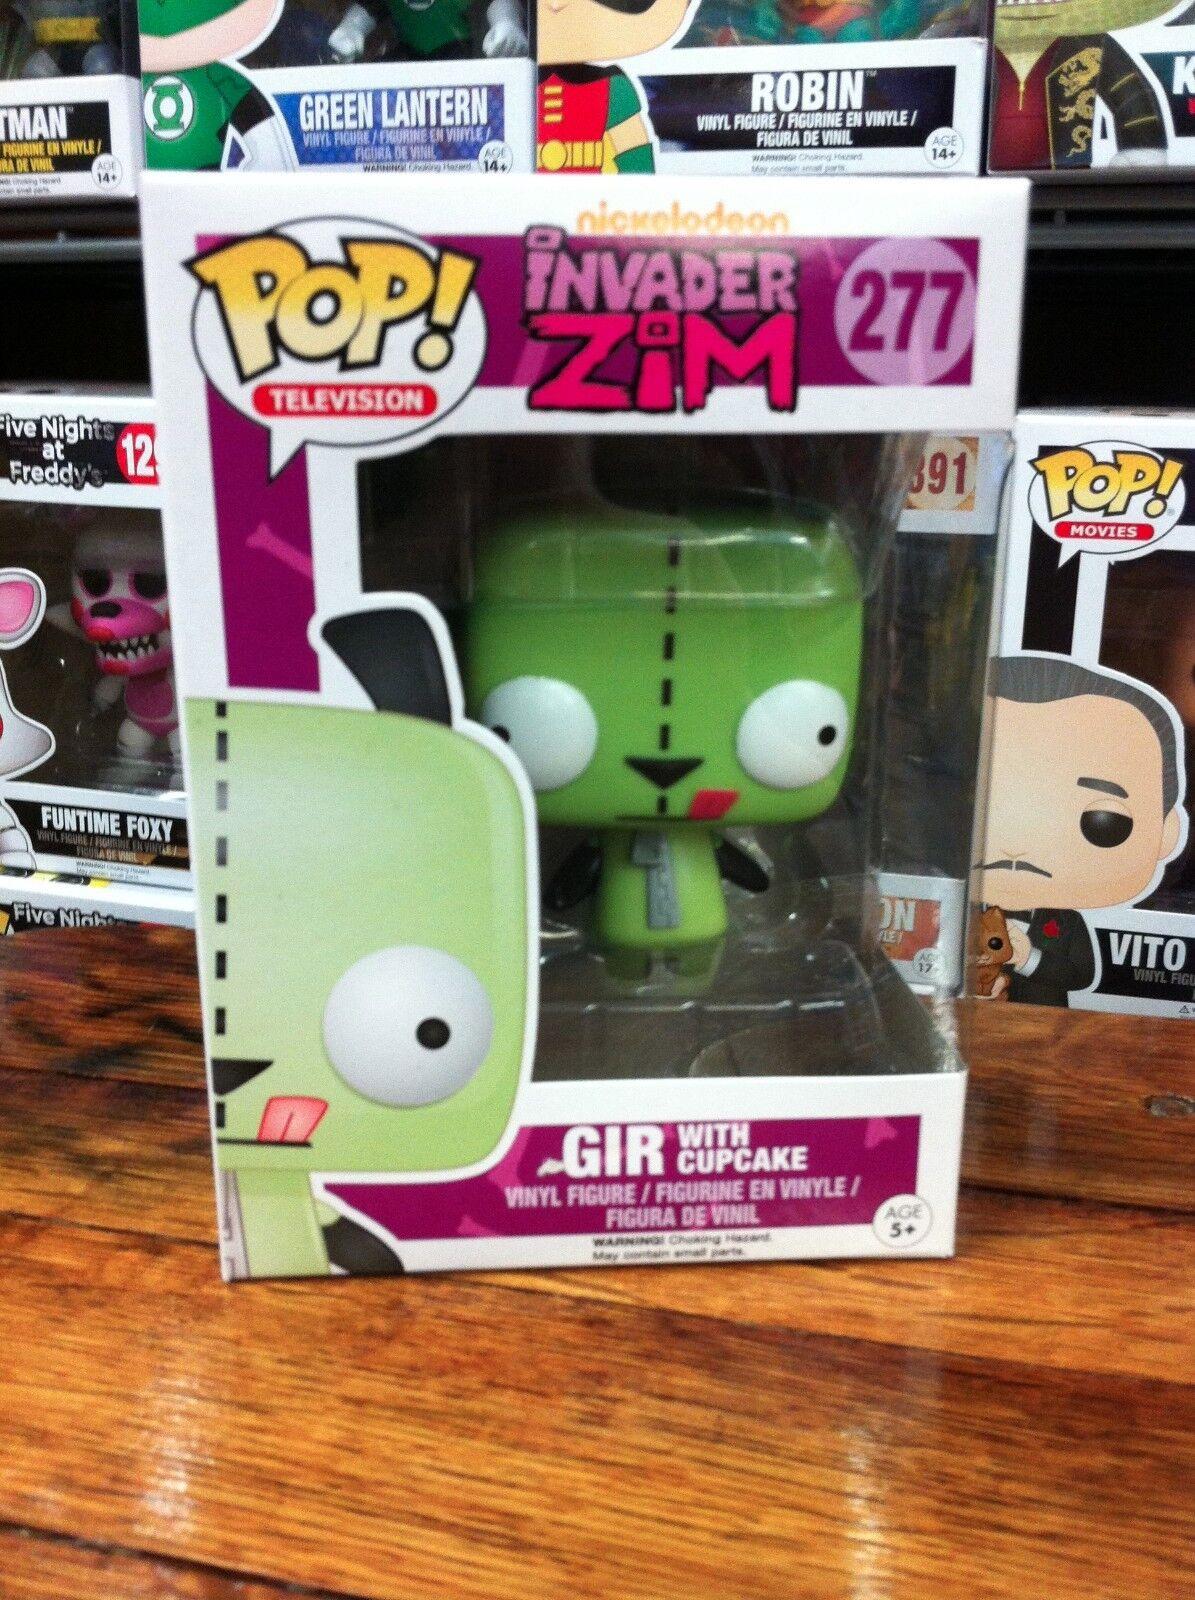 Invader Zim Gir with Cupcake 277 divertiessitoko Pop Vinyl Expert Packaging